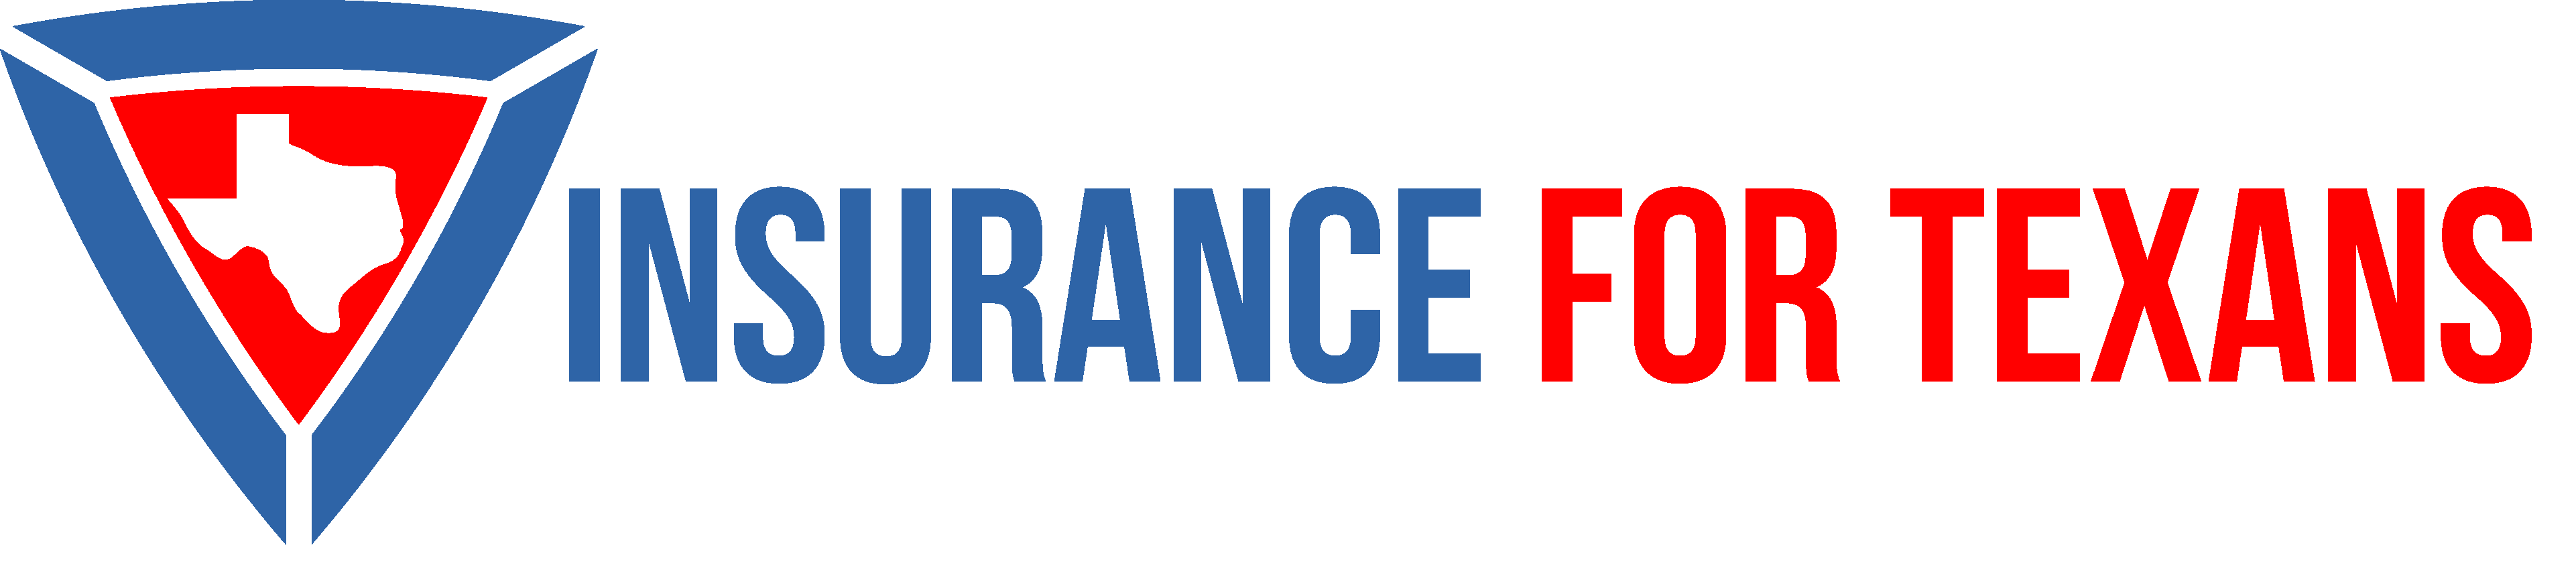 insurancefortexan